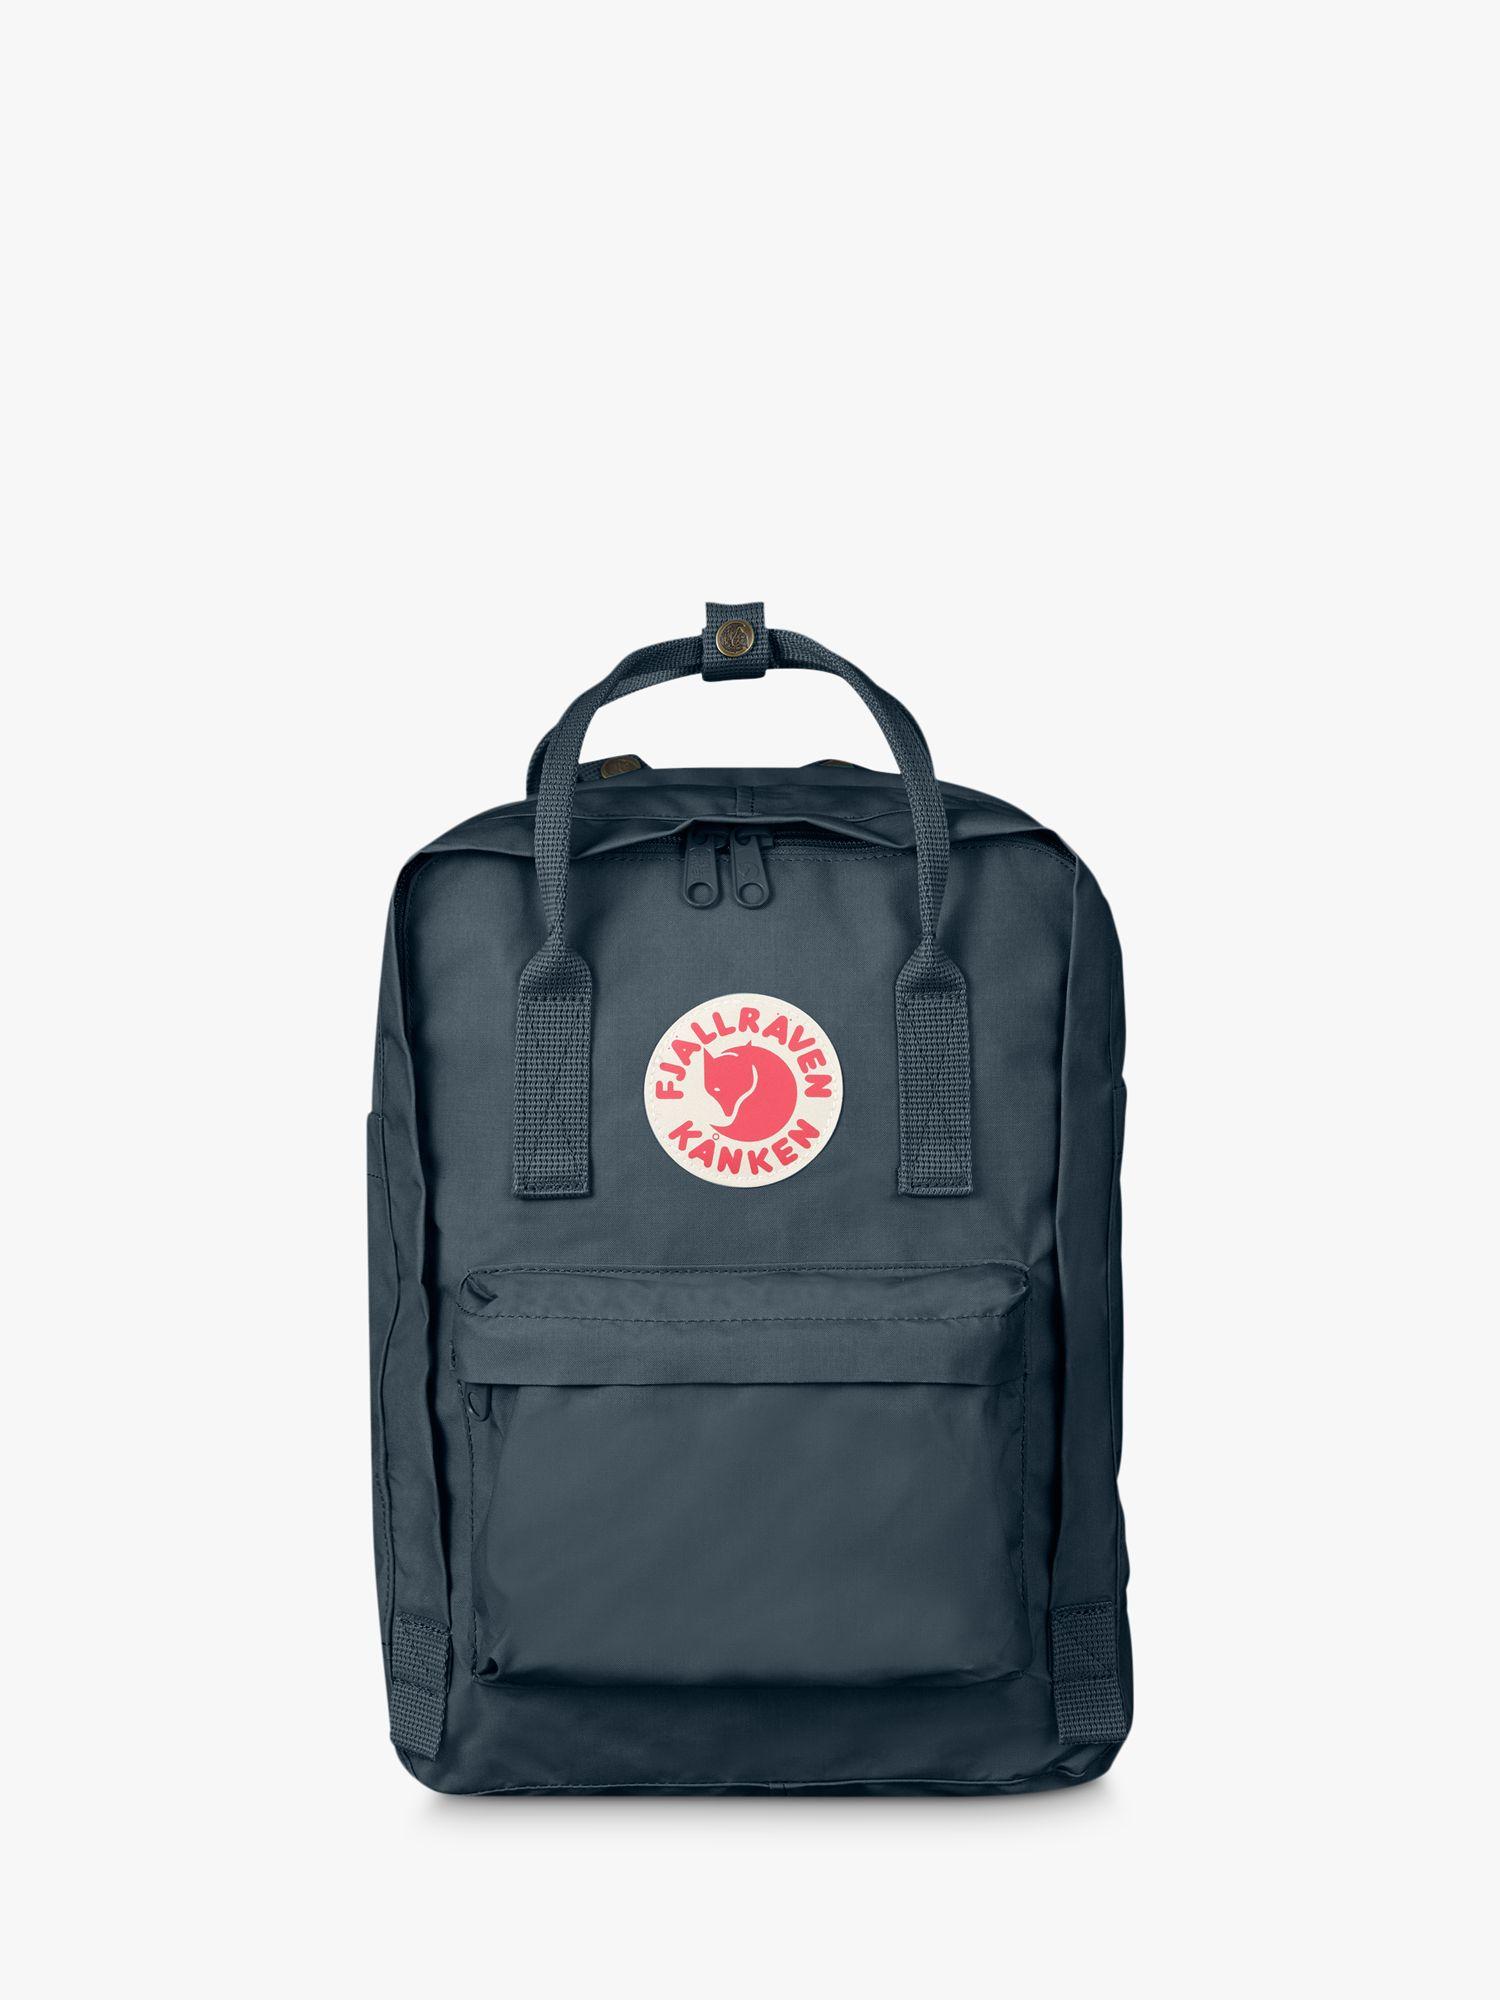 Fjallraven Fjällräven Kånken 13 Laptop Backpack, Graphite